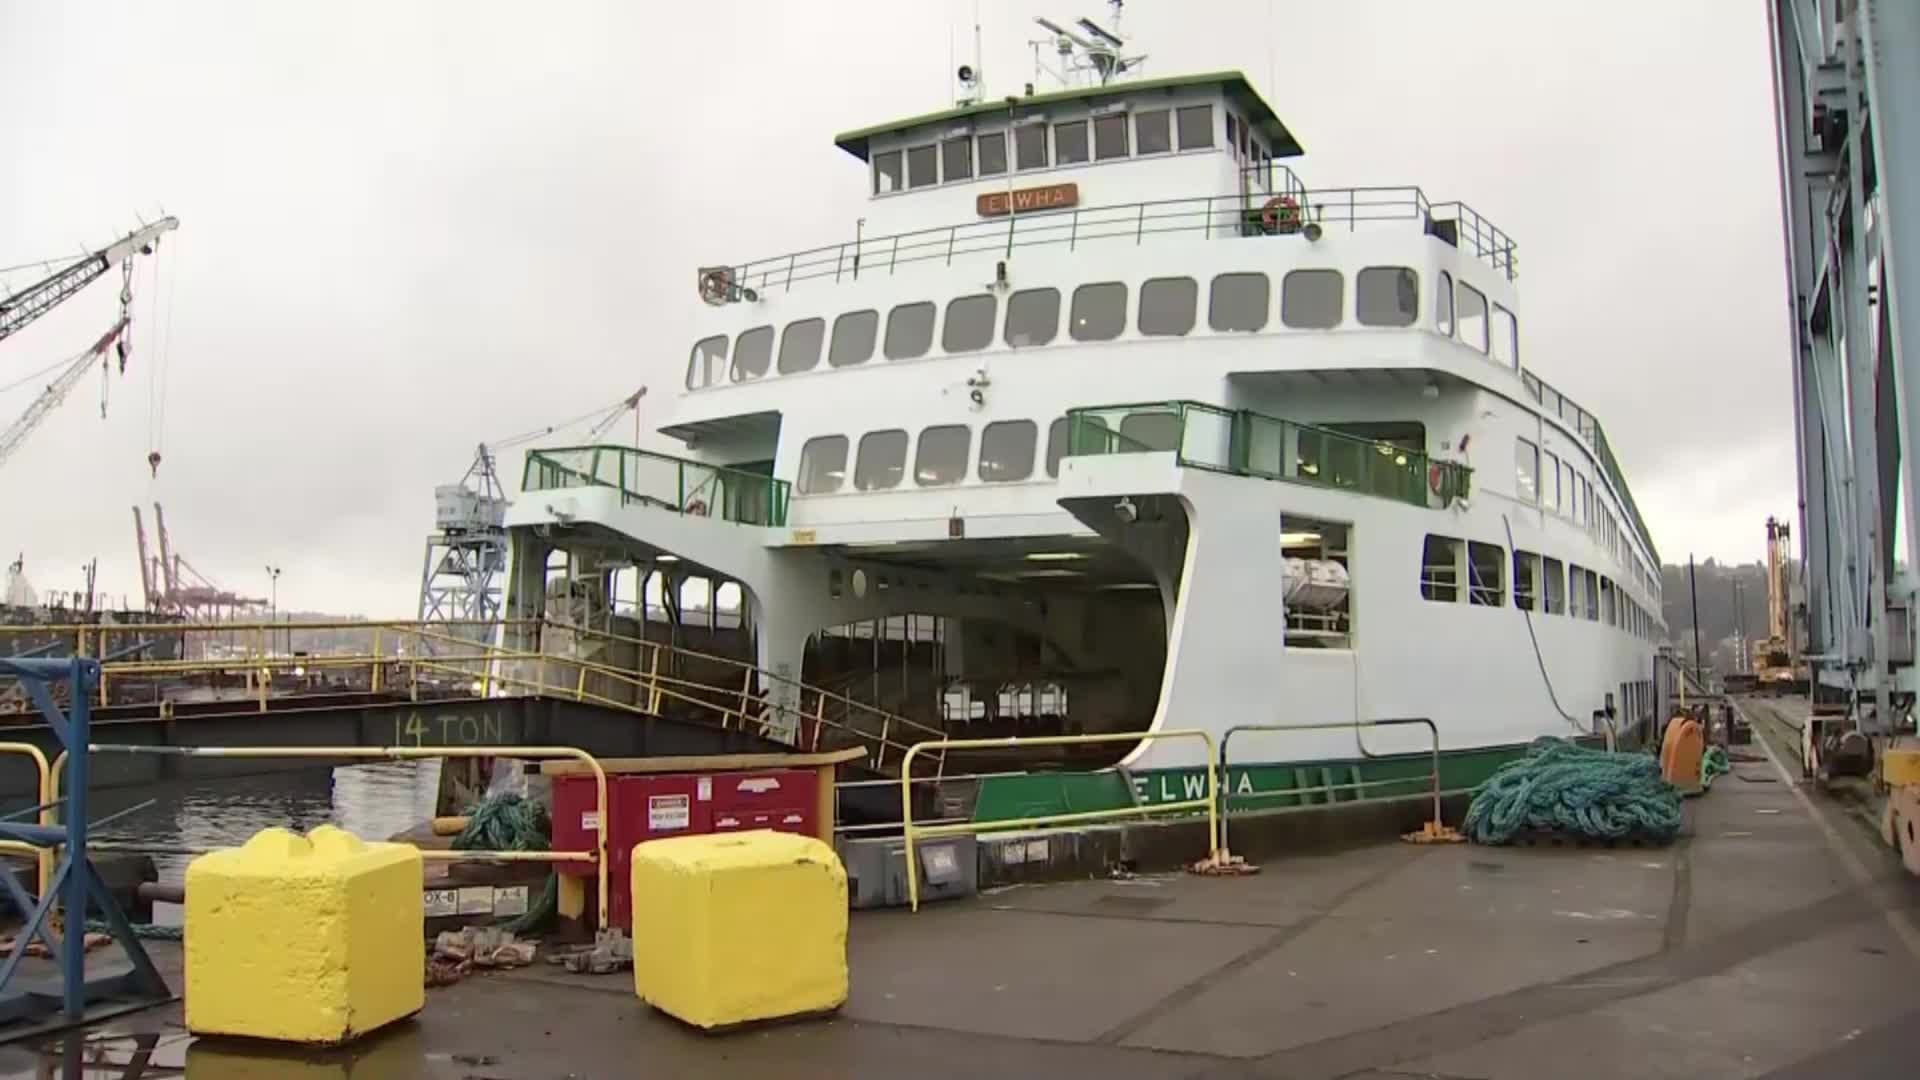 Scuba divers rescued by ferry crews near Edmonds terminal